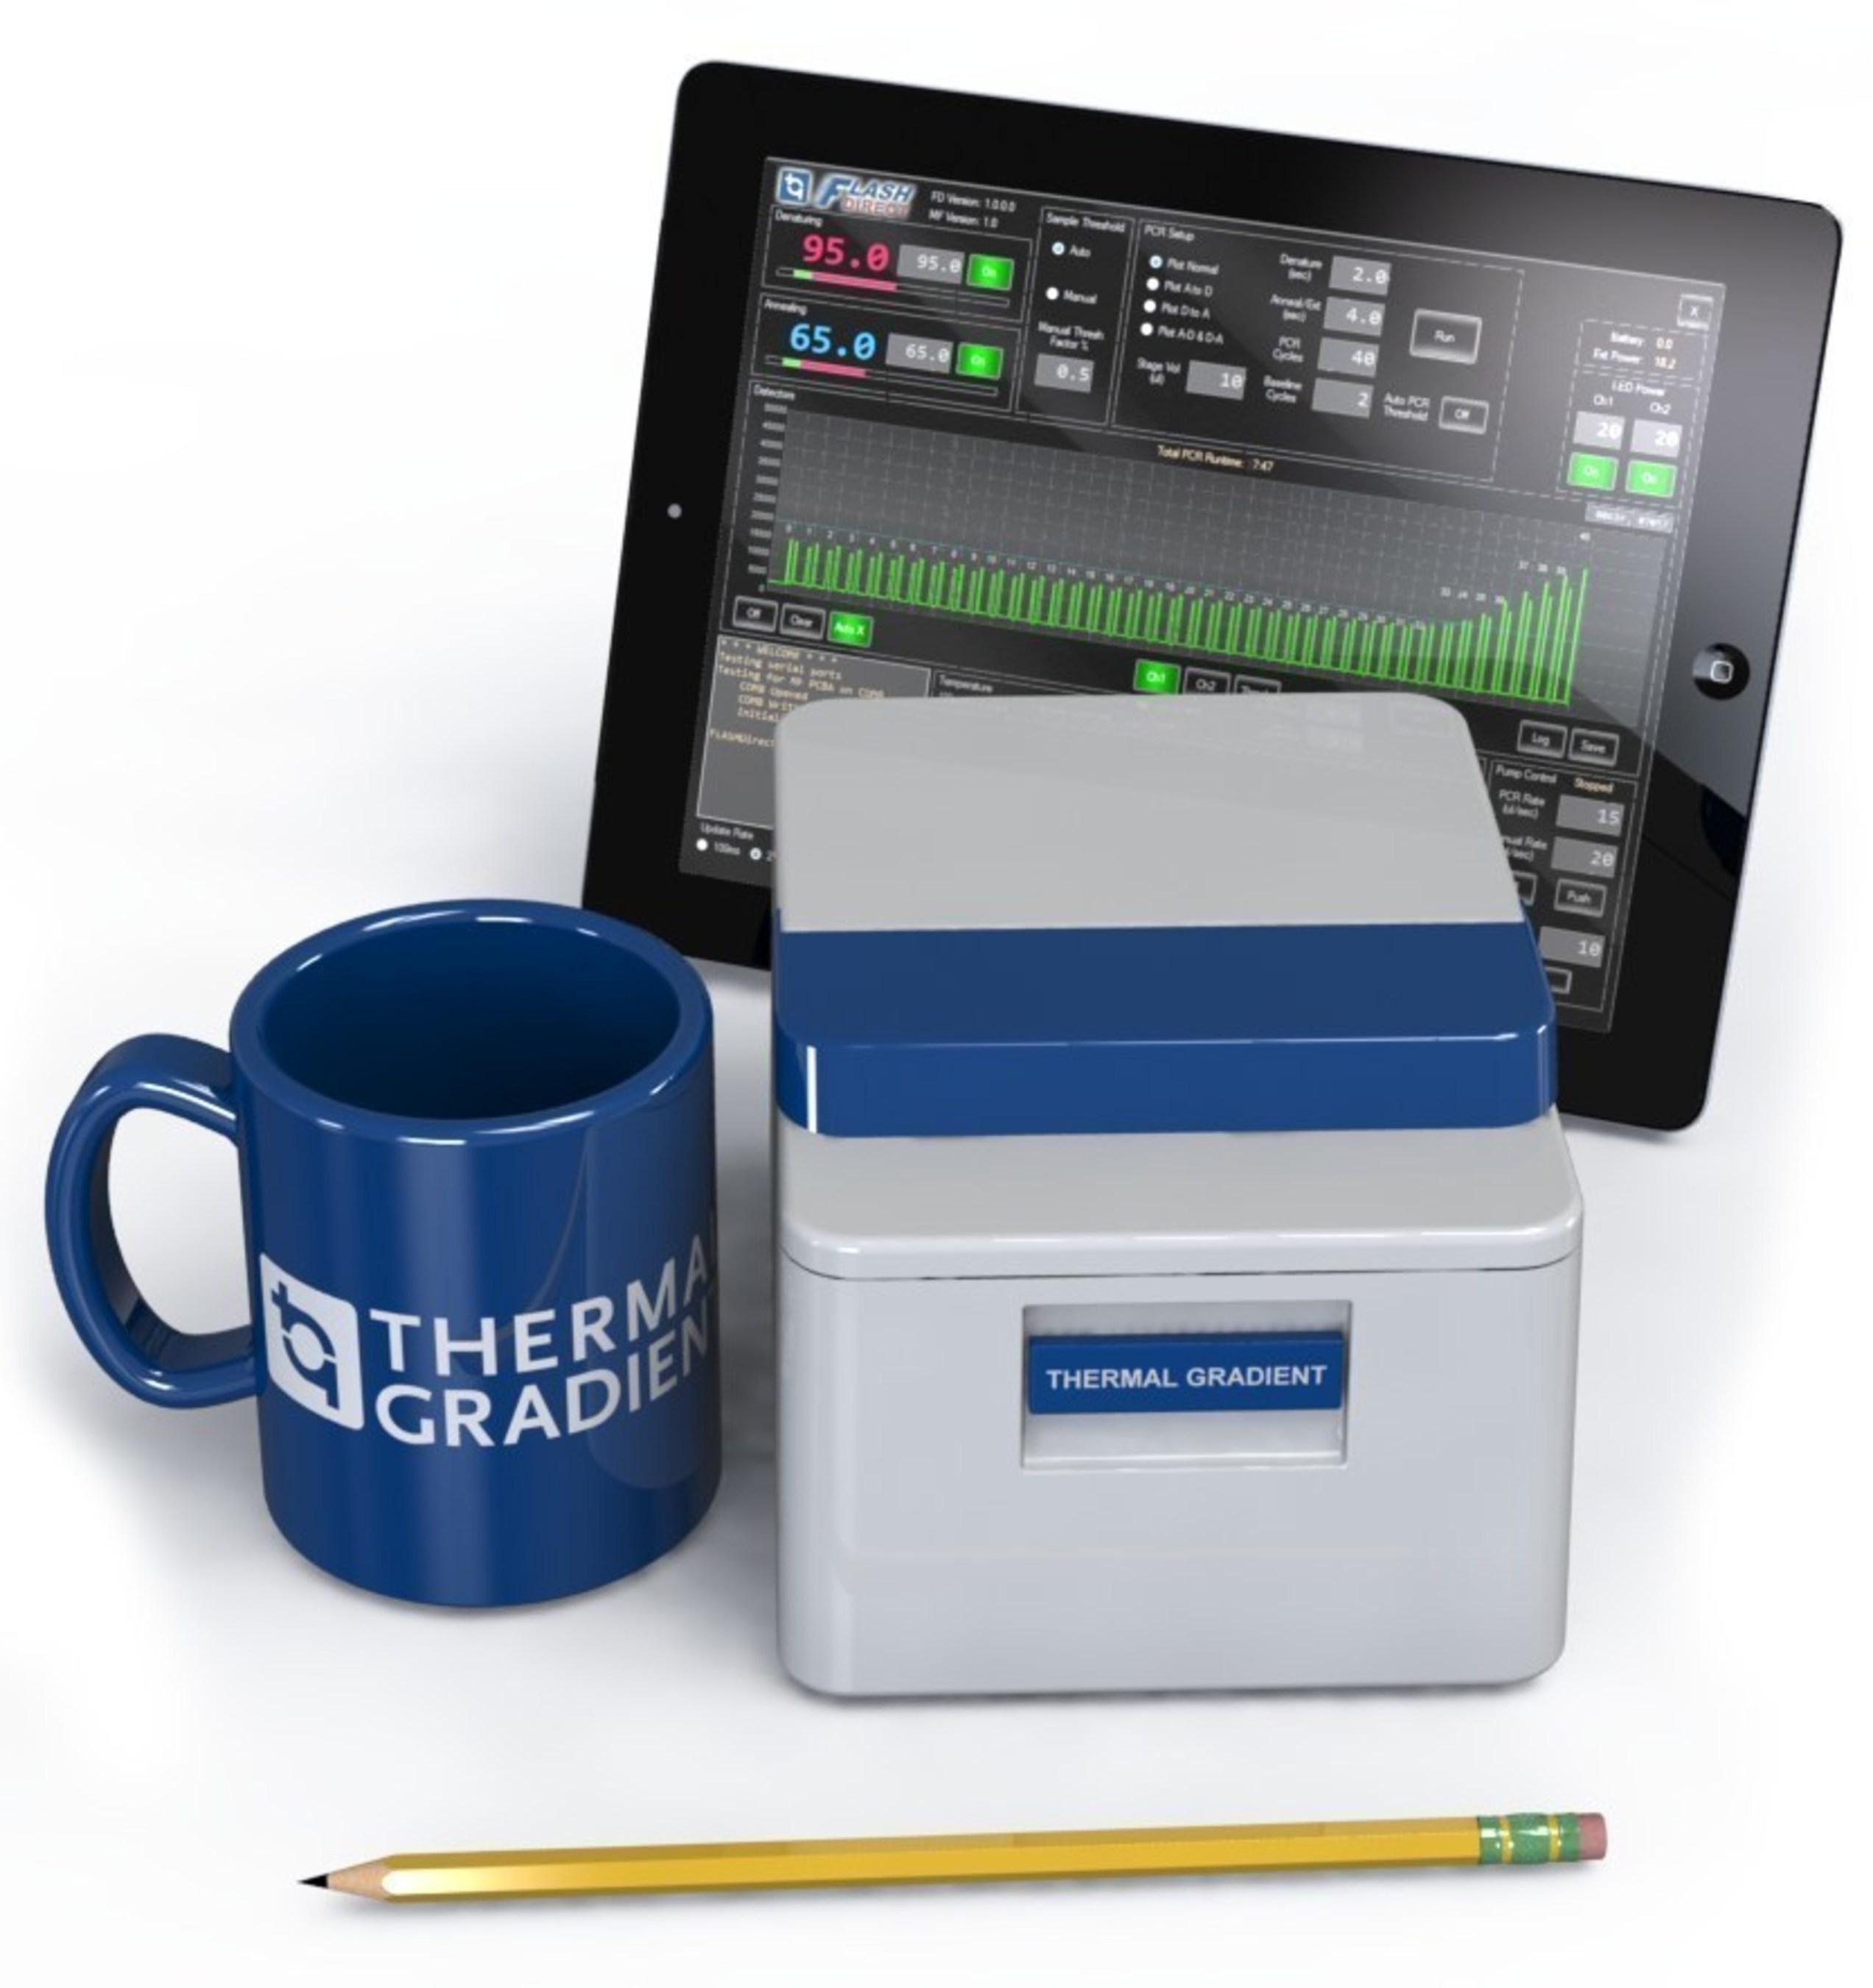 Thermal Gradient's FlashAmp Instrument